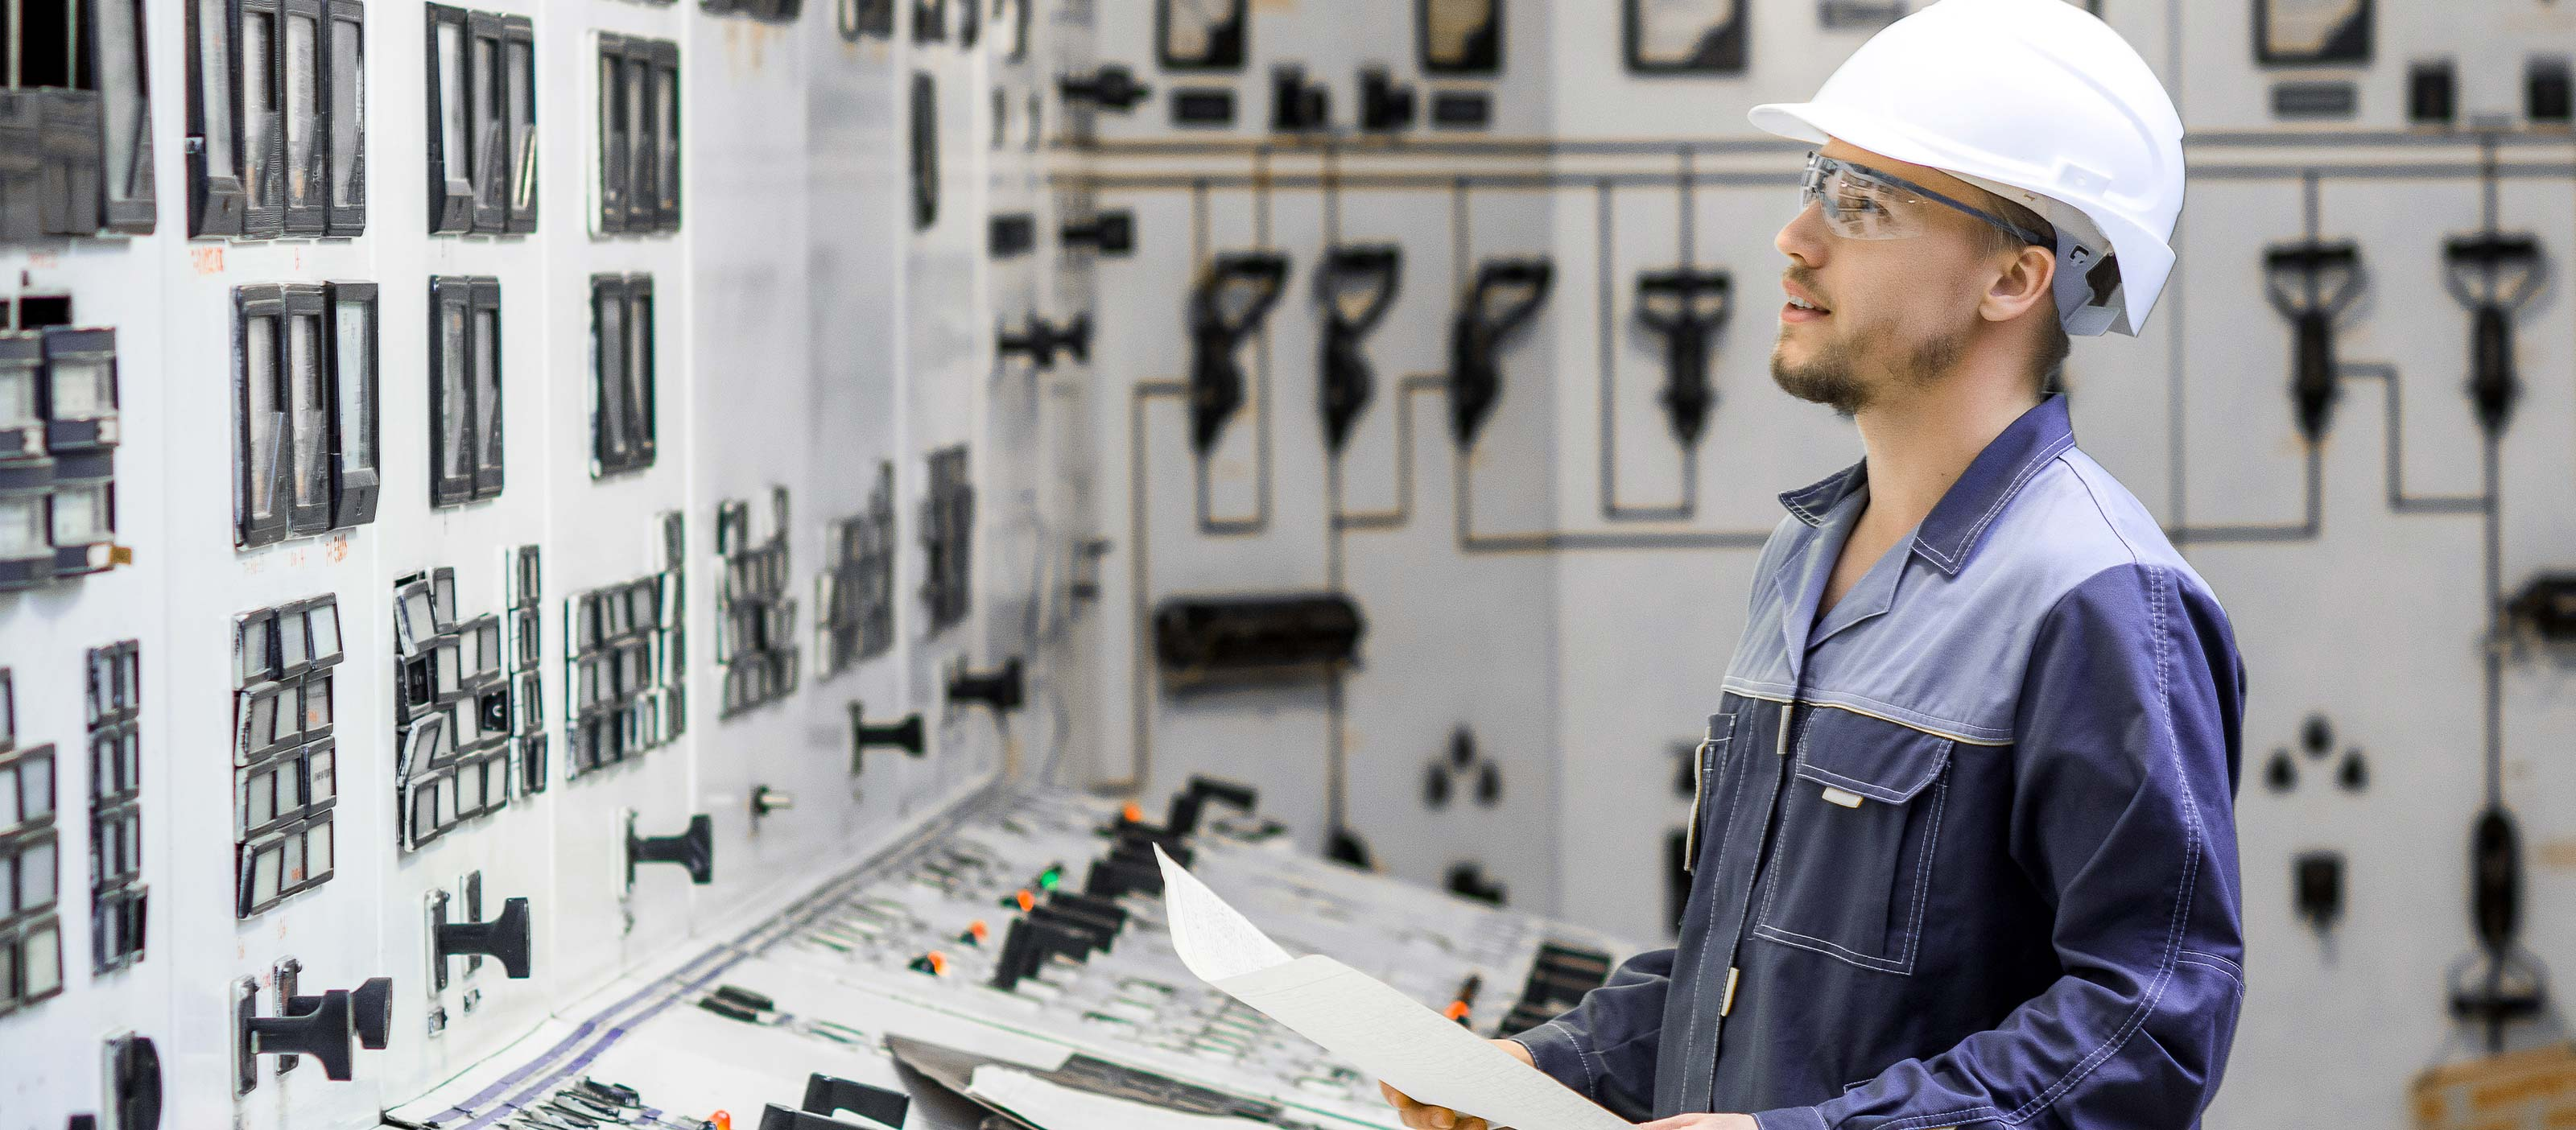 iFIX HMI SCADA software used in industrial operations | GE Digital